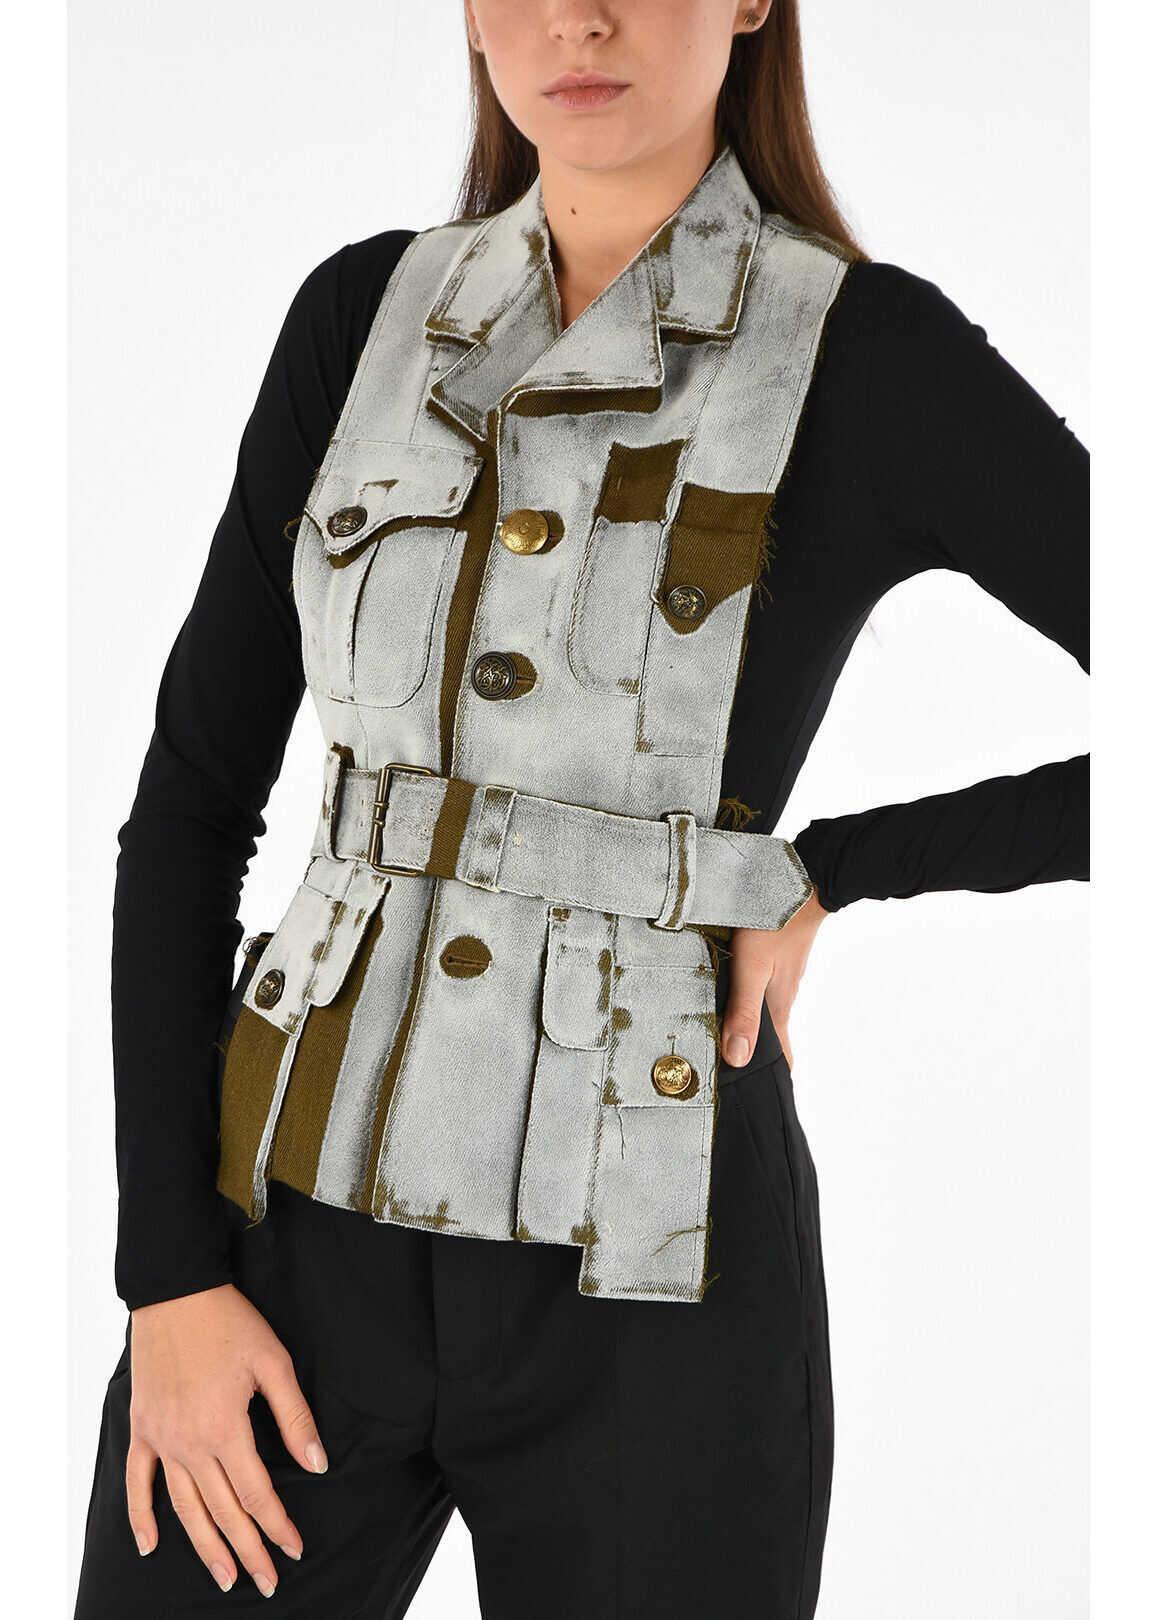 Maison Margiela MM0 Wool Sleeveless Vest GRAY